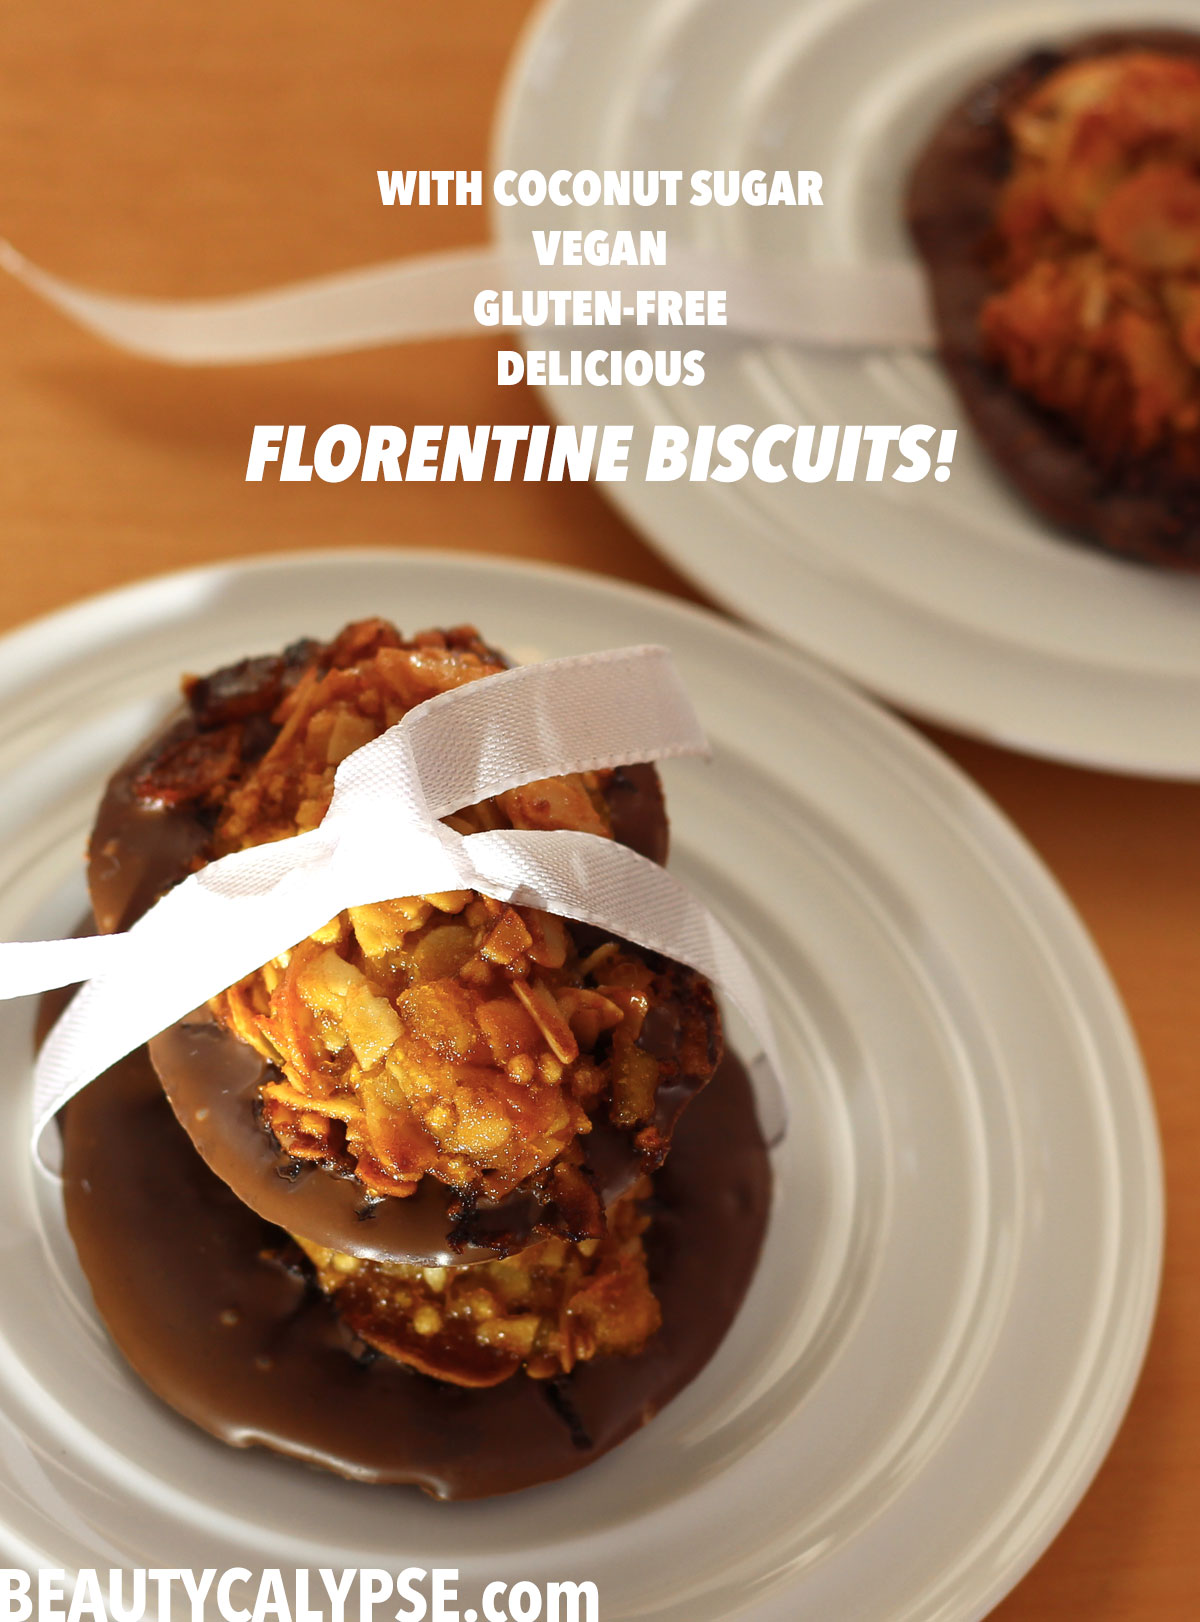 vegan-florentine-biscuits